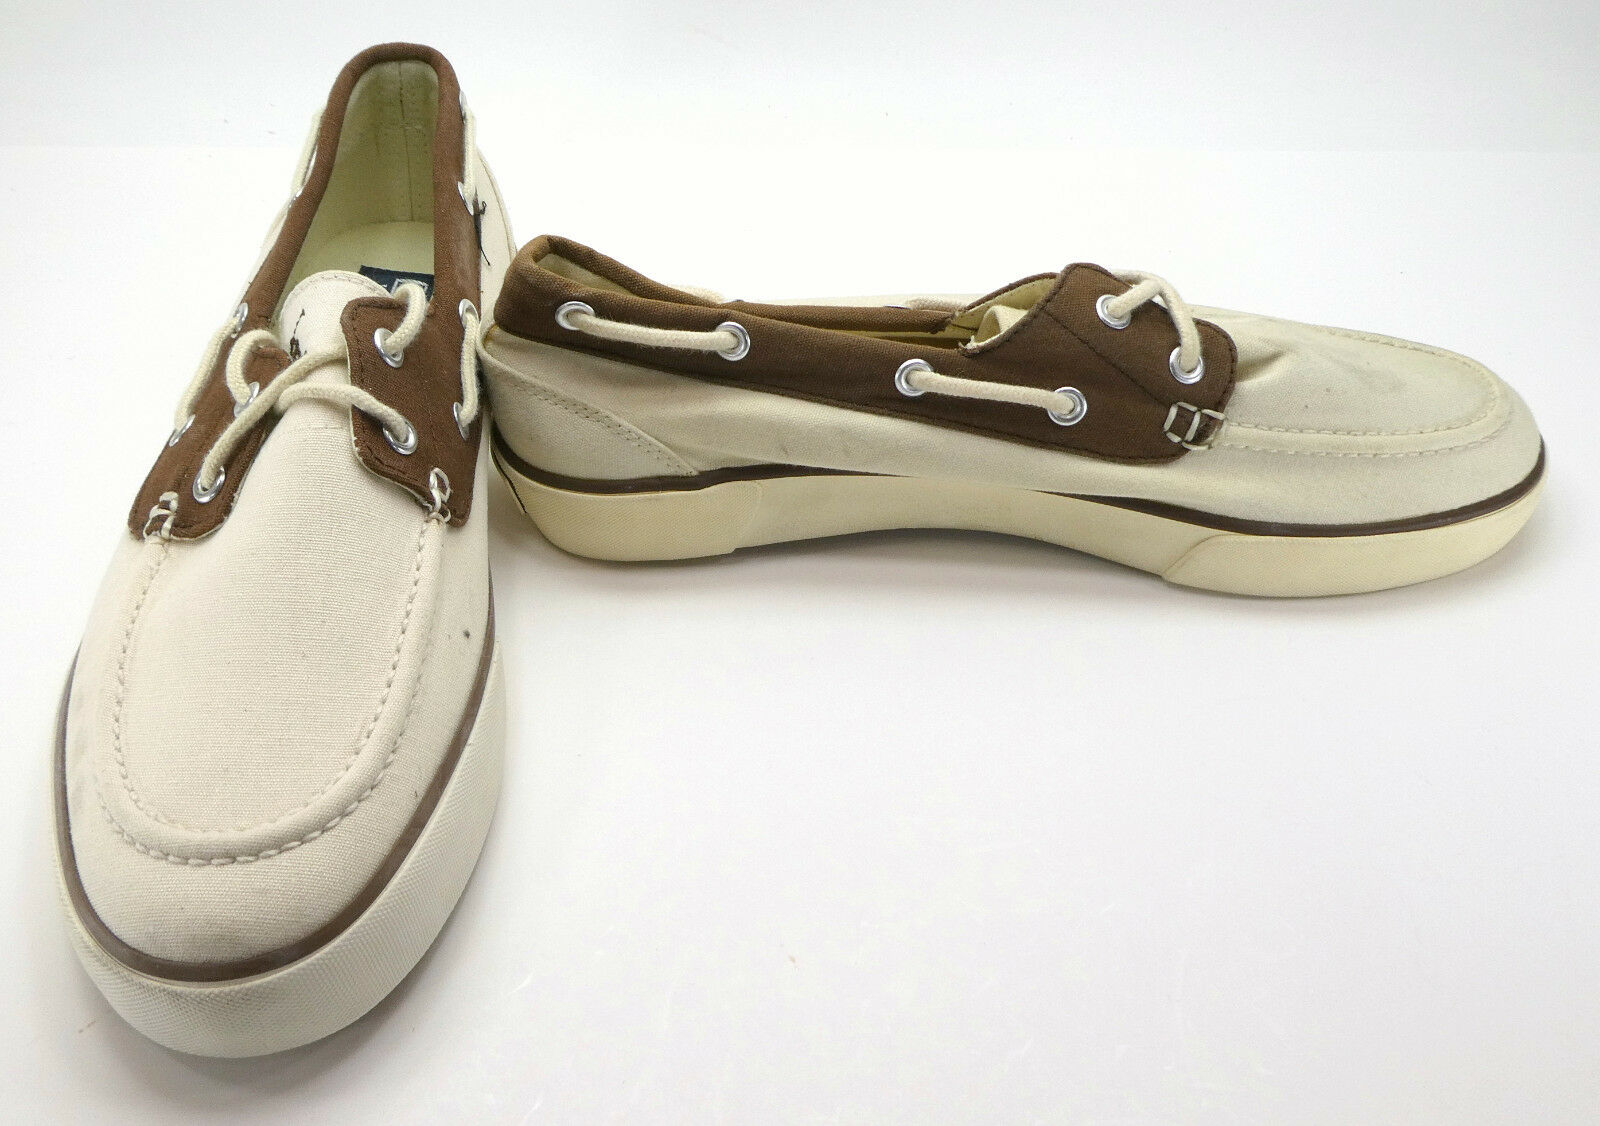 f1c17942b4b Ralph Lauren Boat shoes Lander Canvas Khaki Beige Brown Topsiders ...